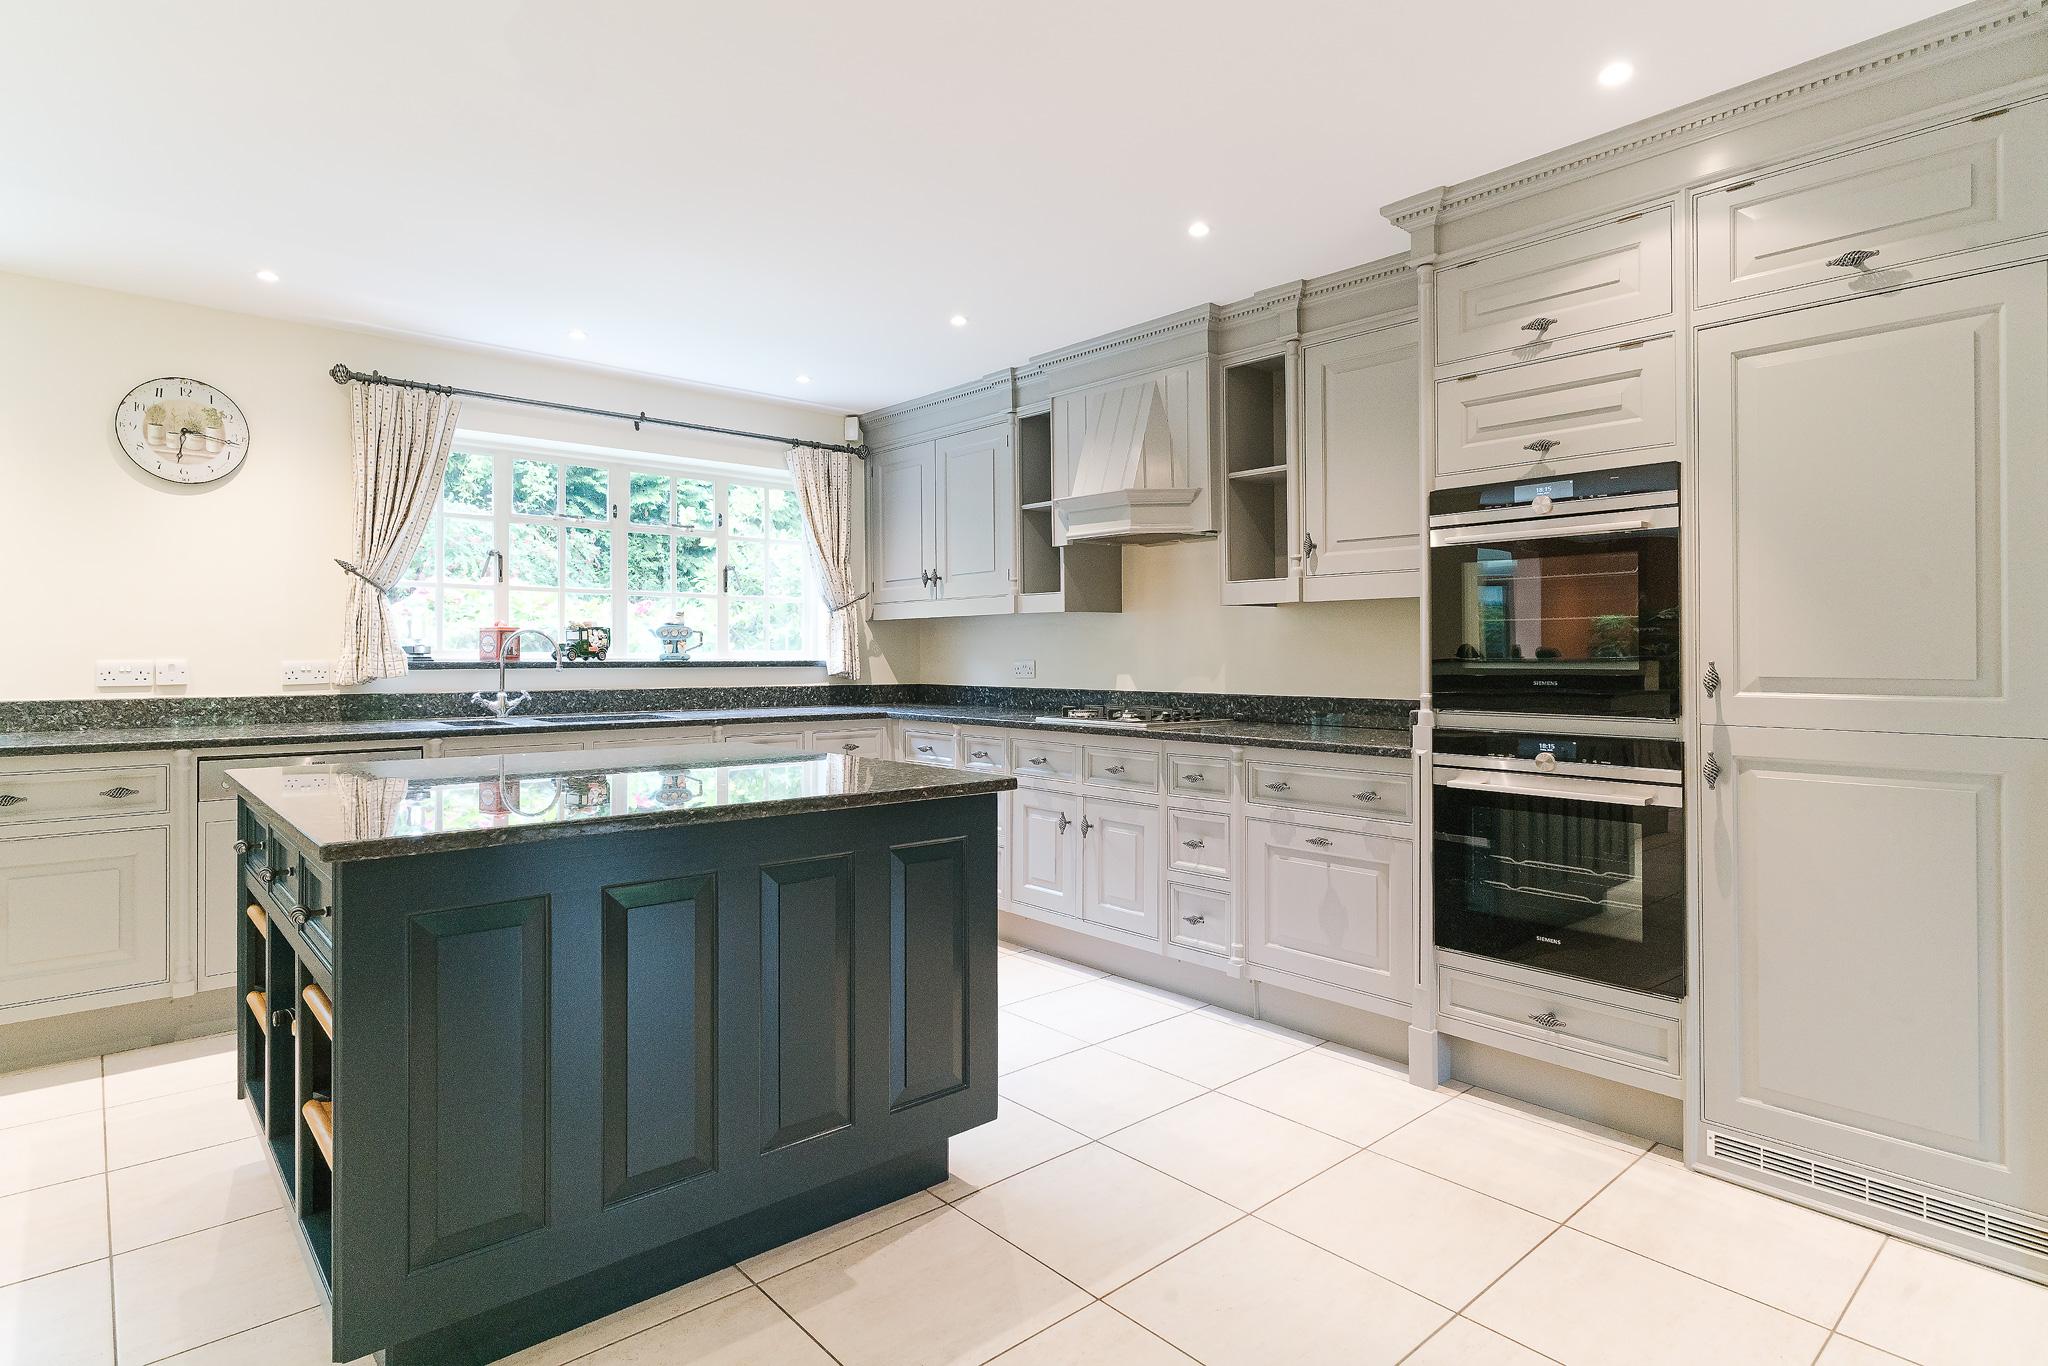 Smallbone Kitchen Cabinet Painters London Highgate | Kevin ...